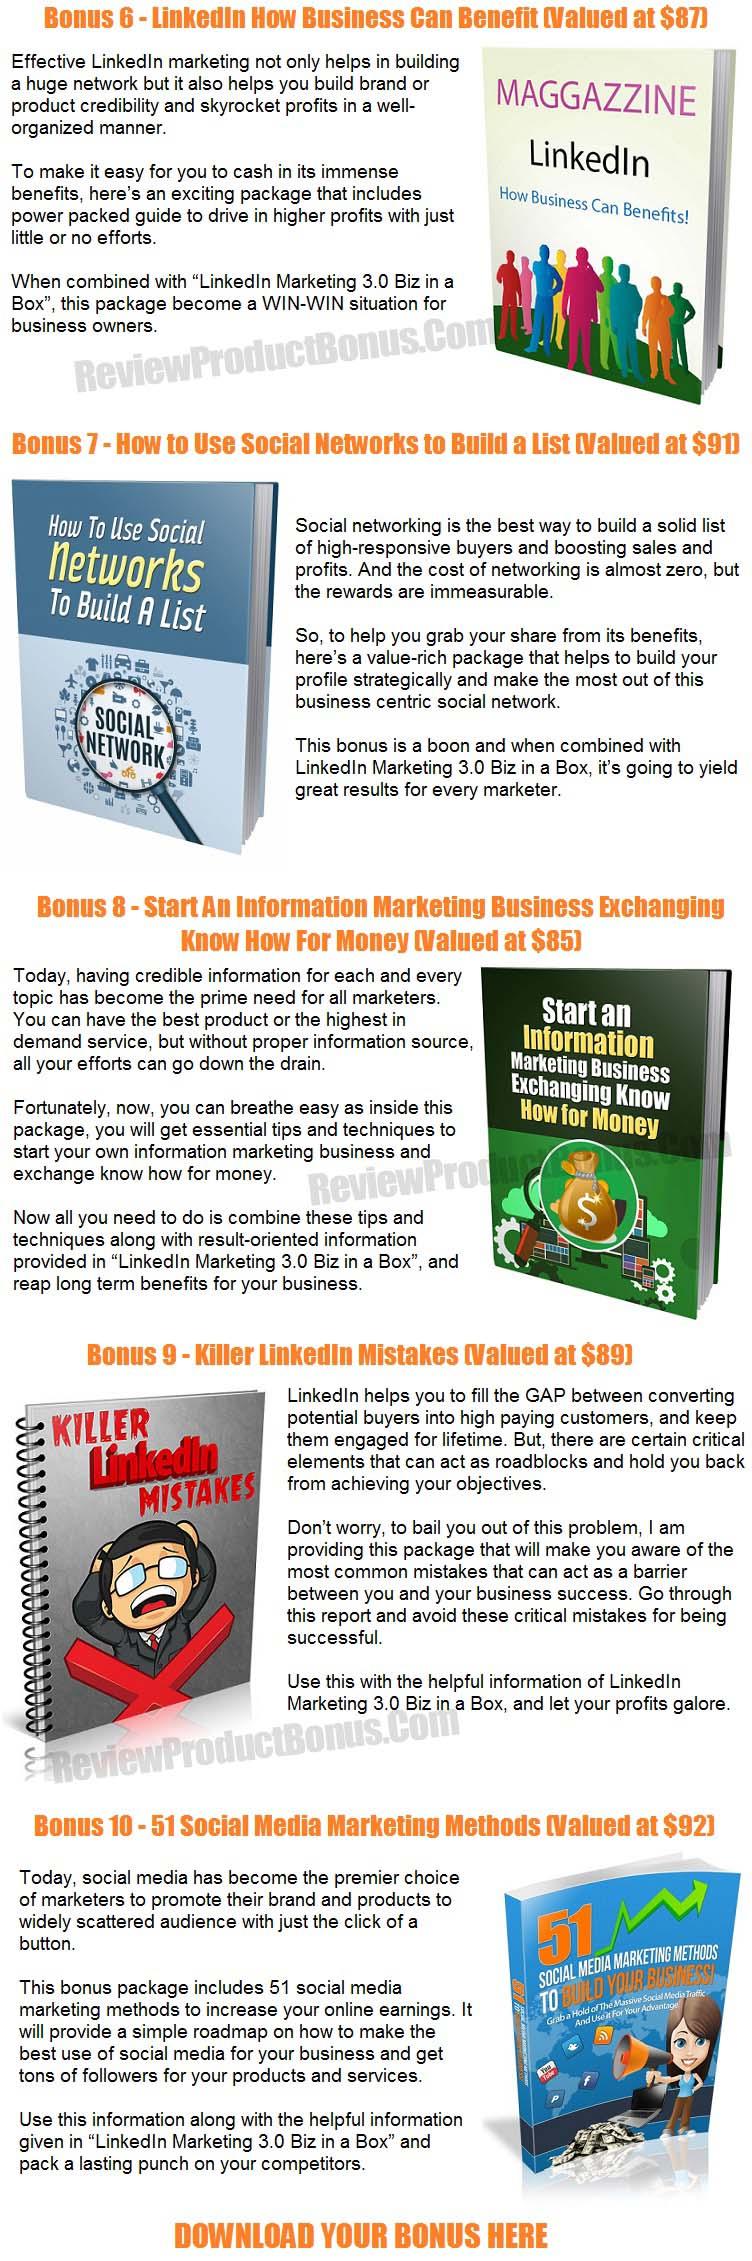 LinkedIn Marketing 3.0 Bonuses